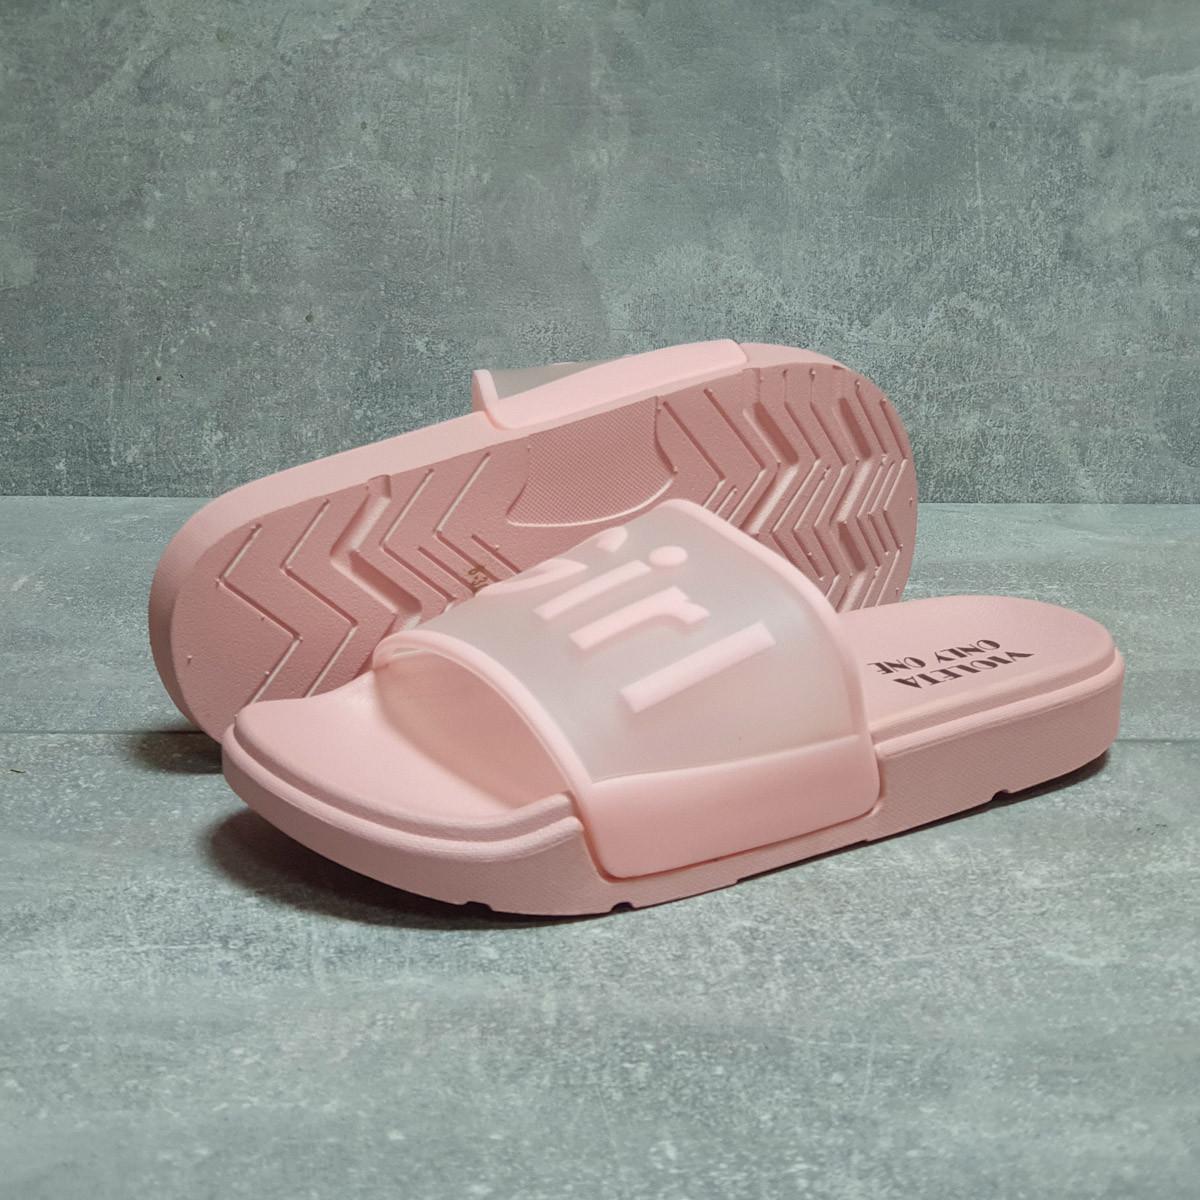 Шлепанцы женские 17466, Super Girl, светло-розовые, < 37 38 39 > р. 37-23,3см.